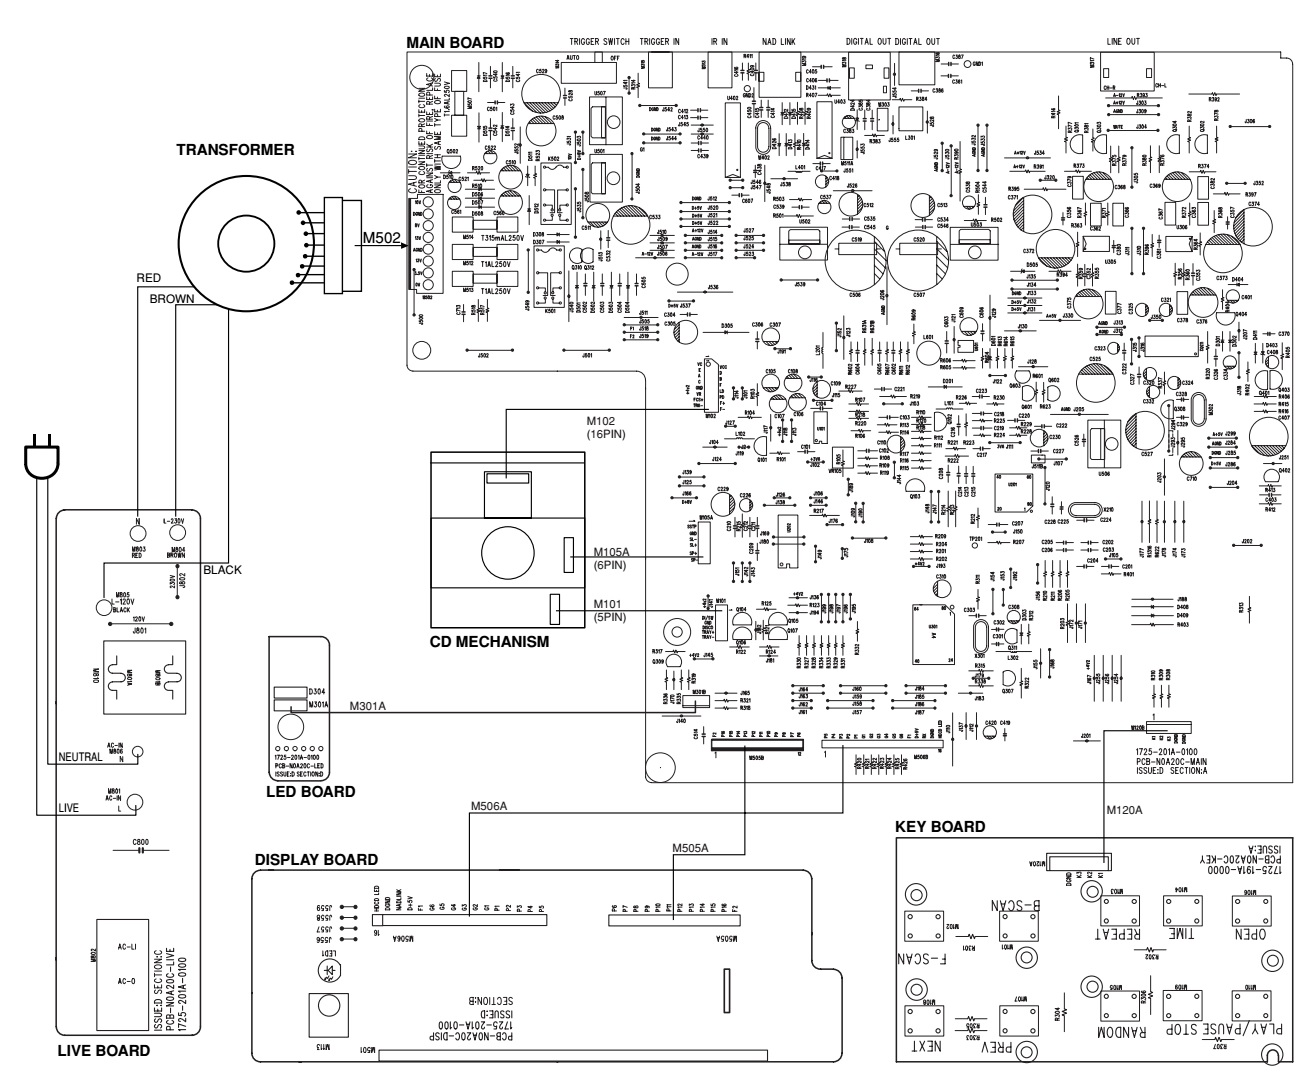 circuit board diagram main pcb schematic diagram